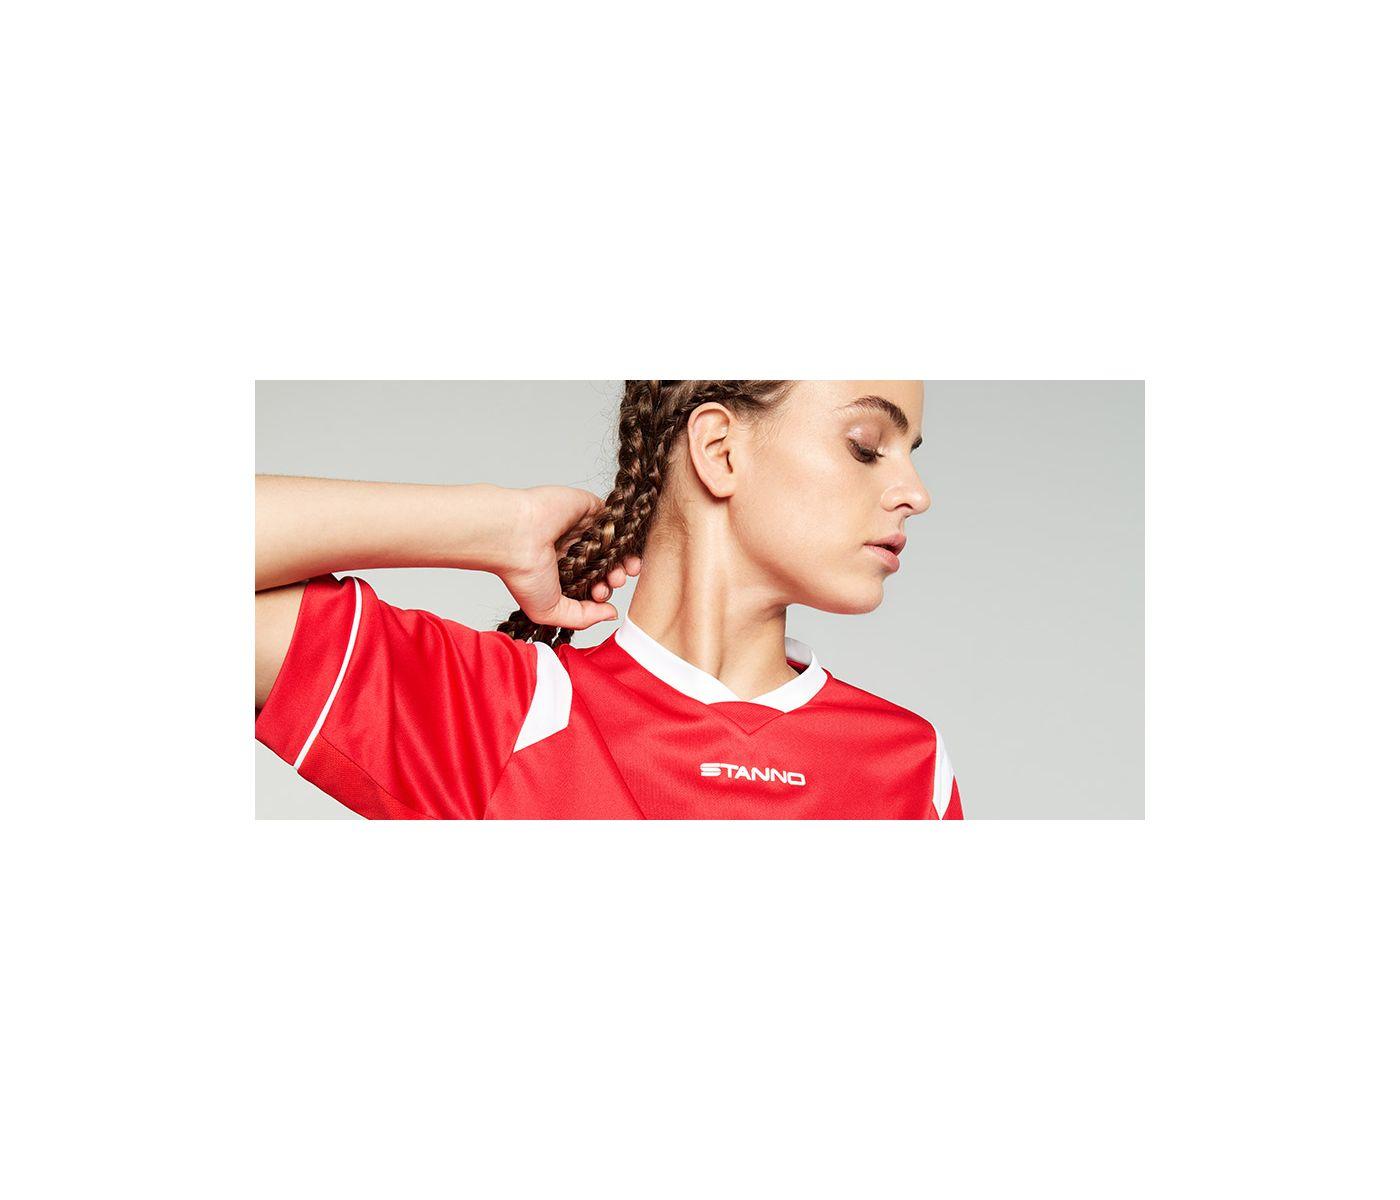 stade_collectie_sporten